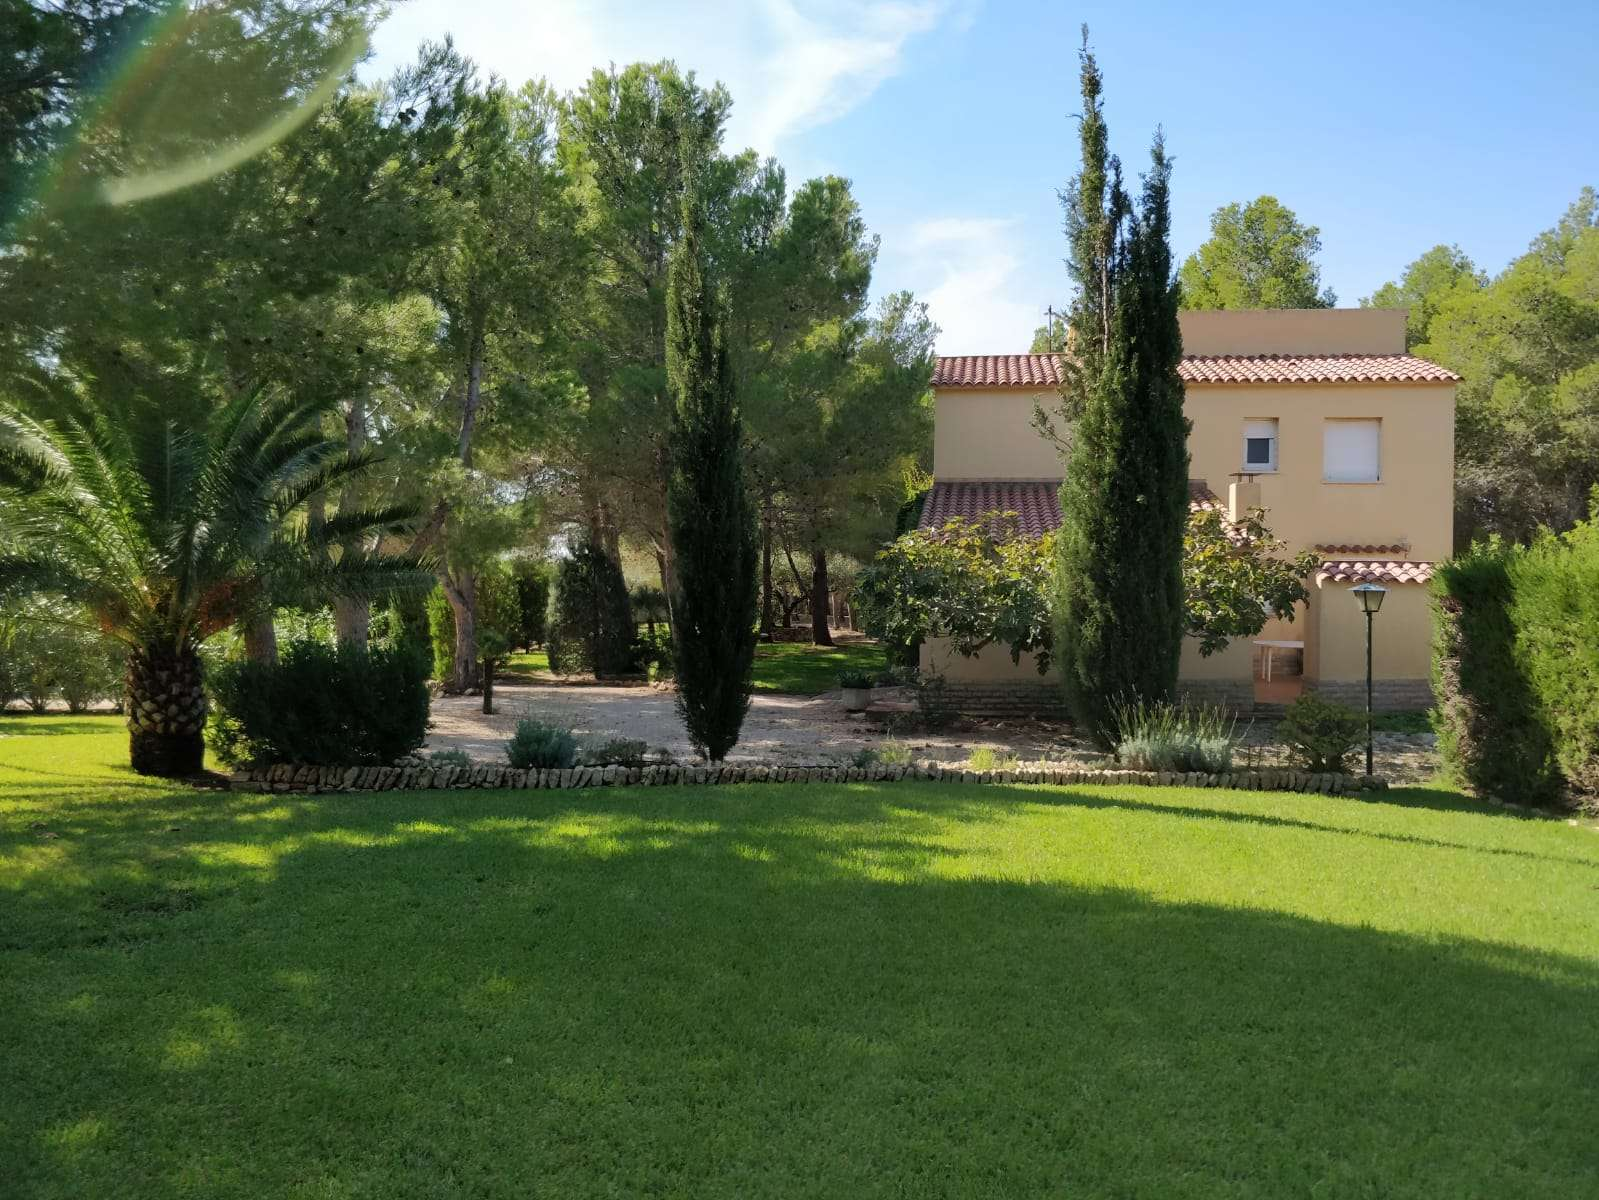 House in Ametlla de Mar (Tarragona)